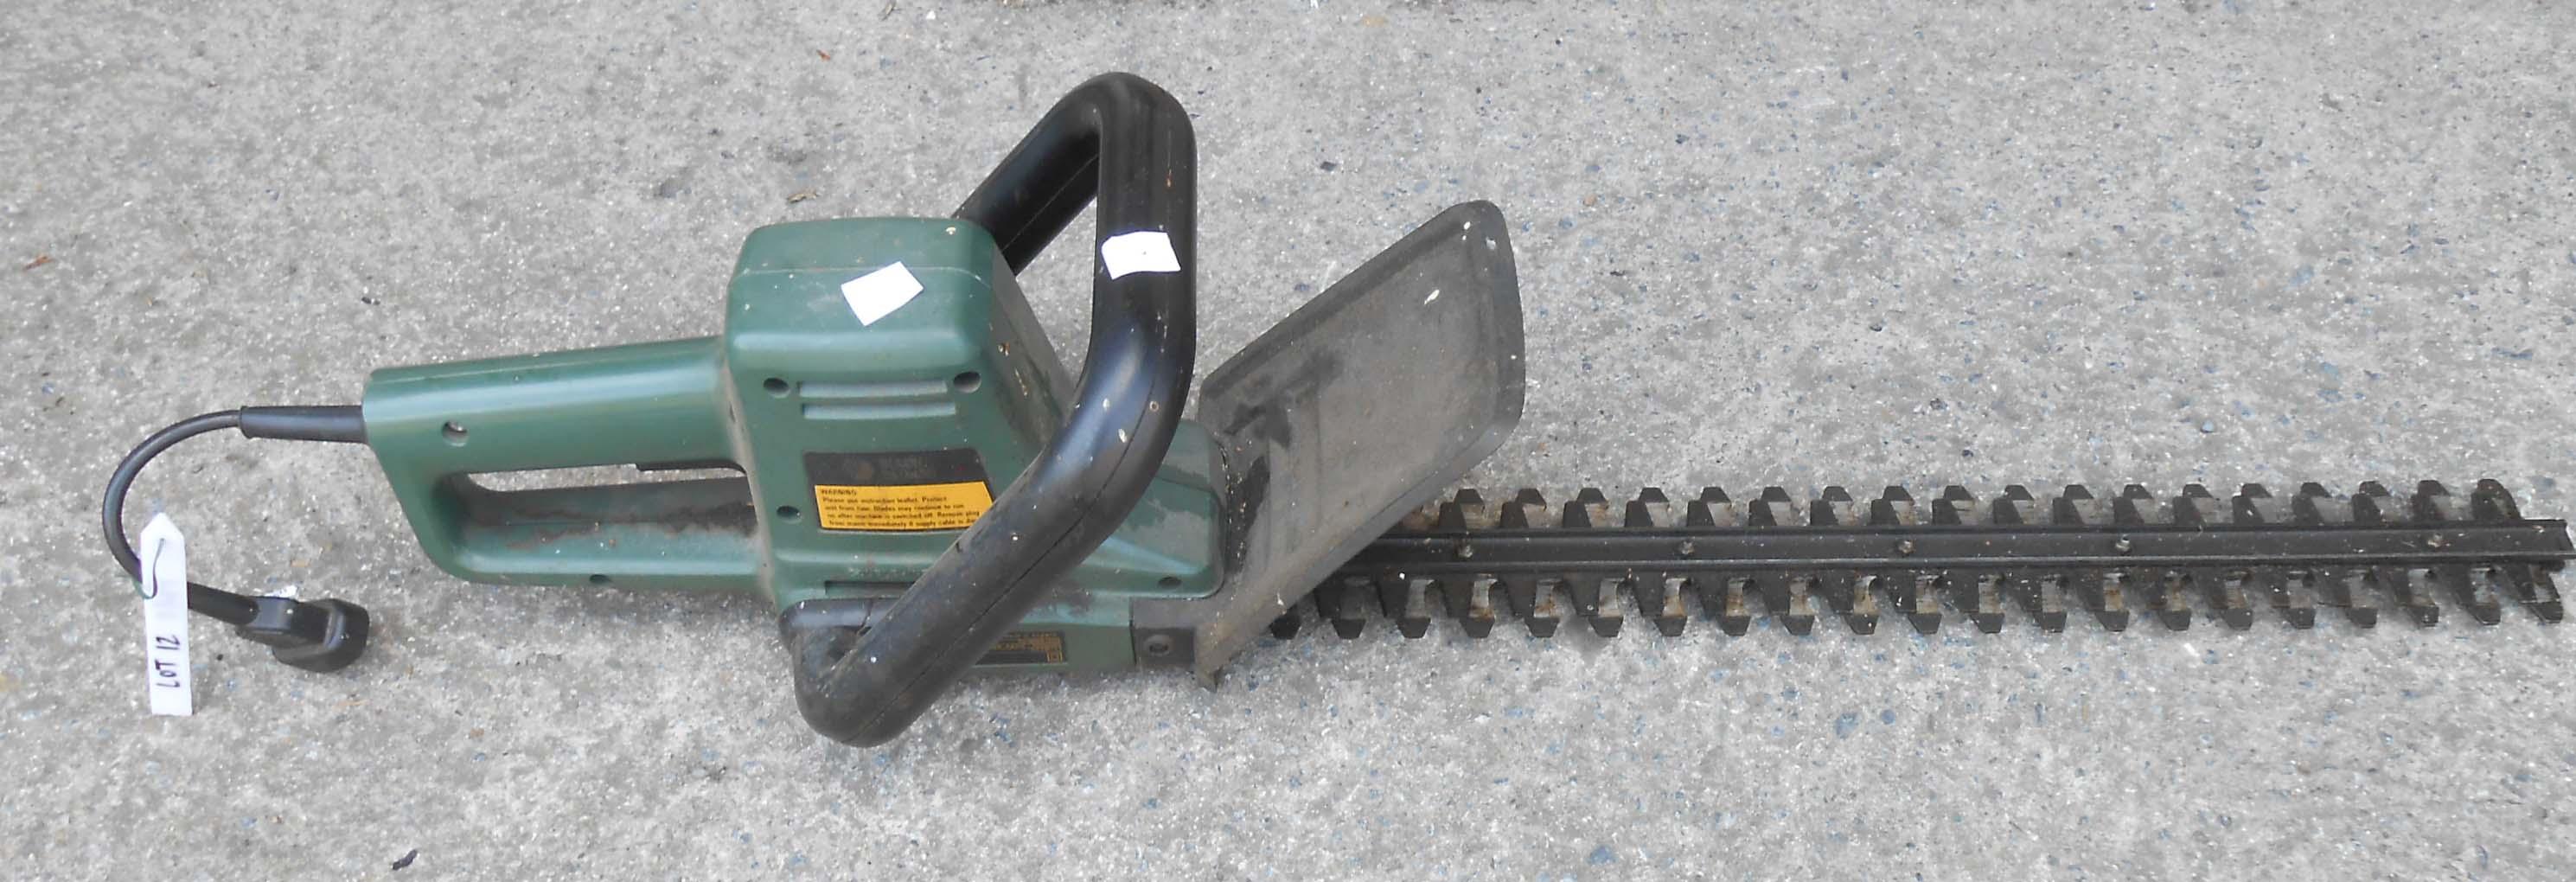 A Black & Decker 50cm GT 231 hedge trimmer